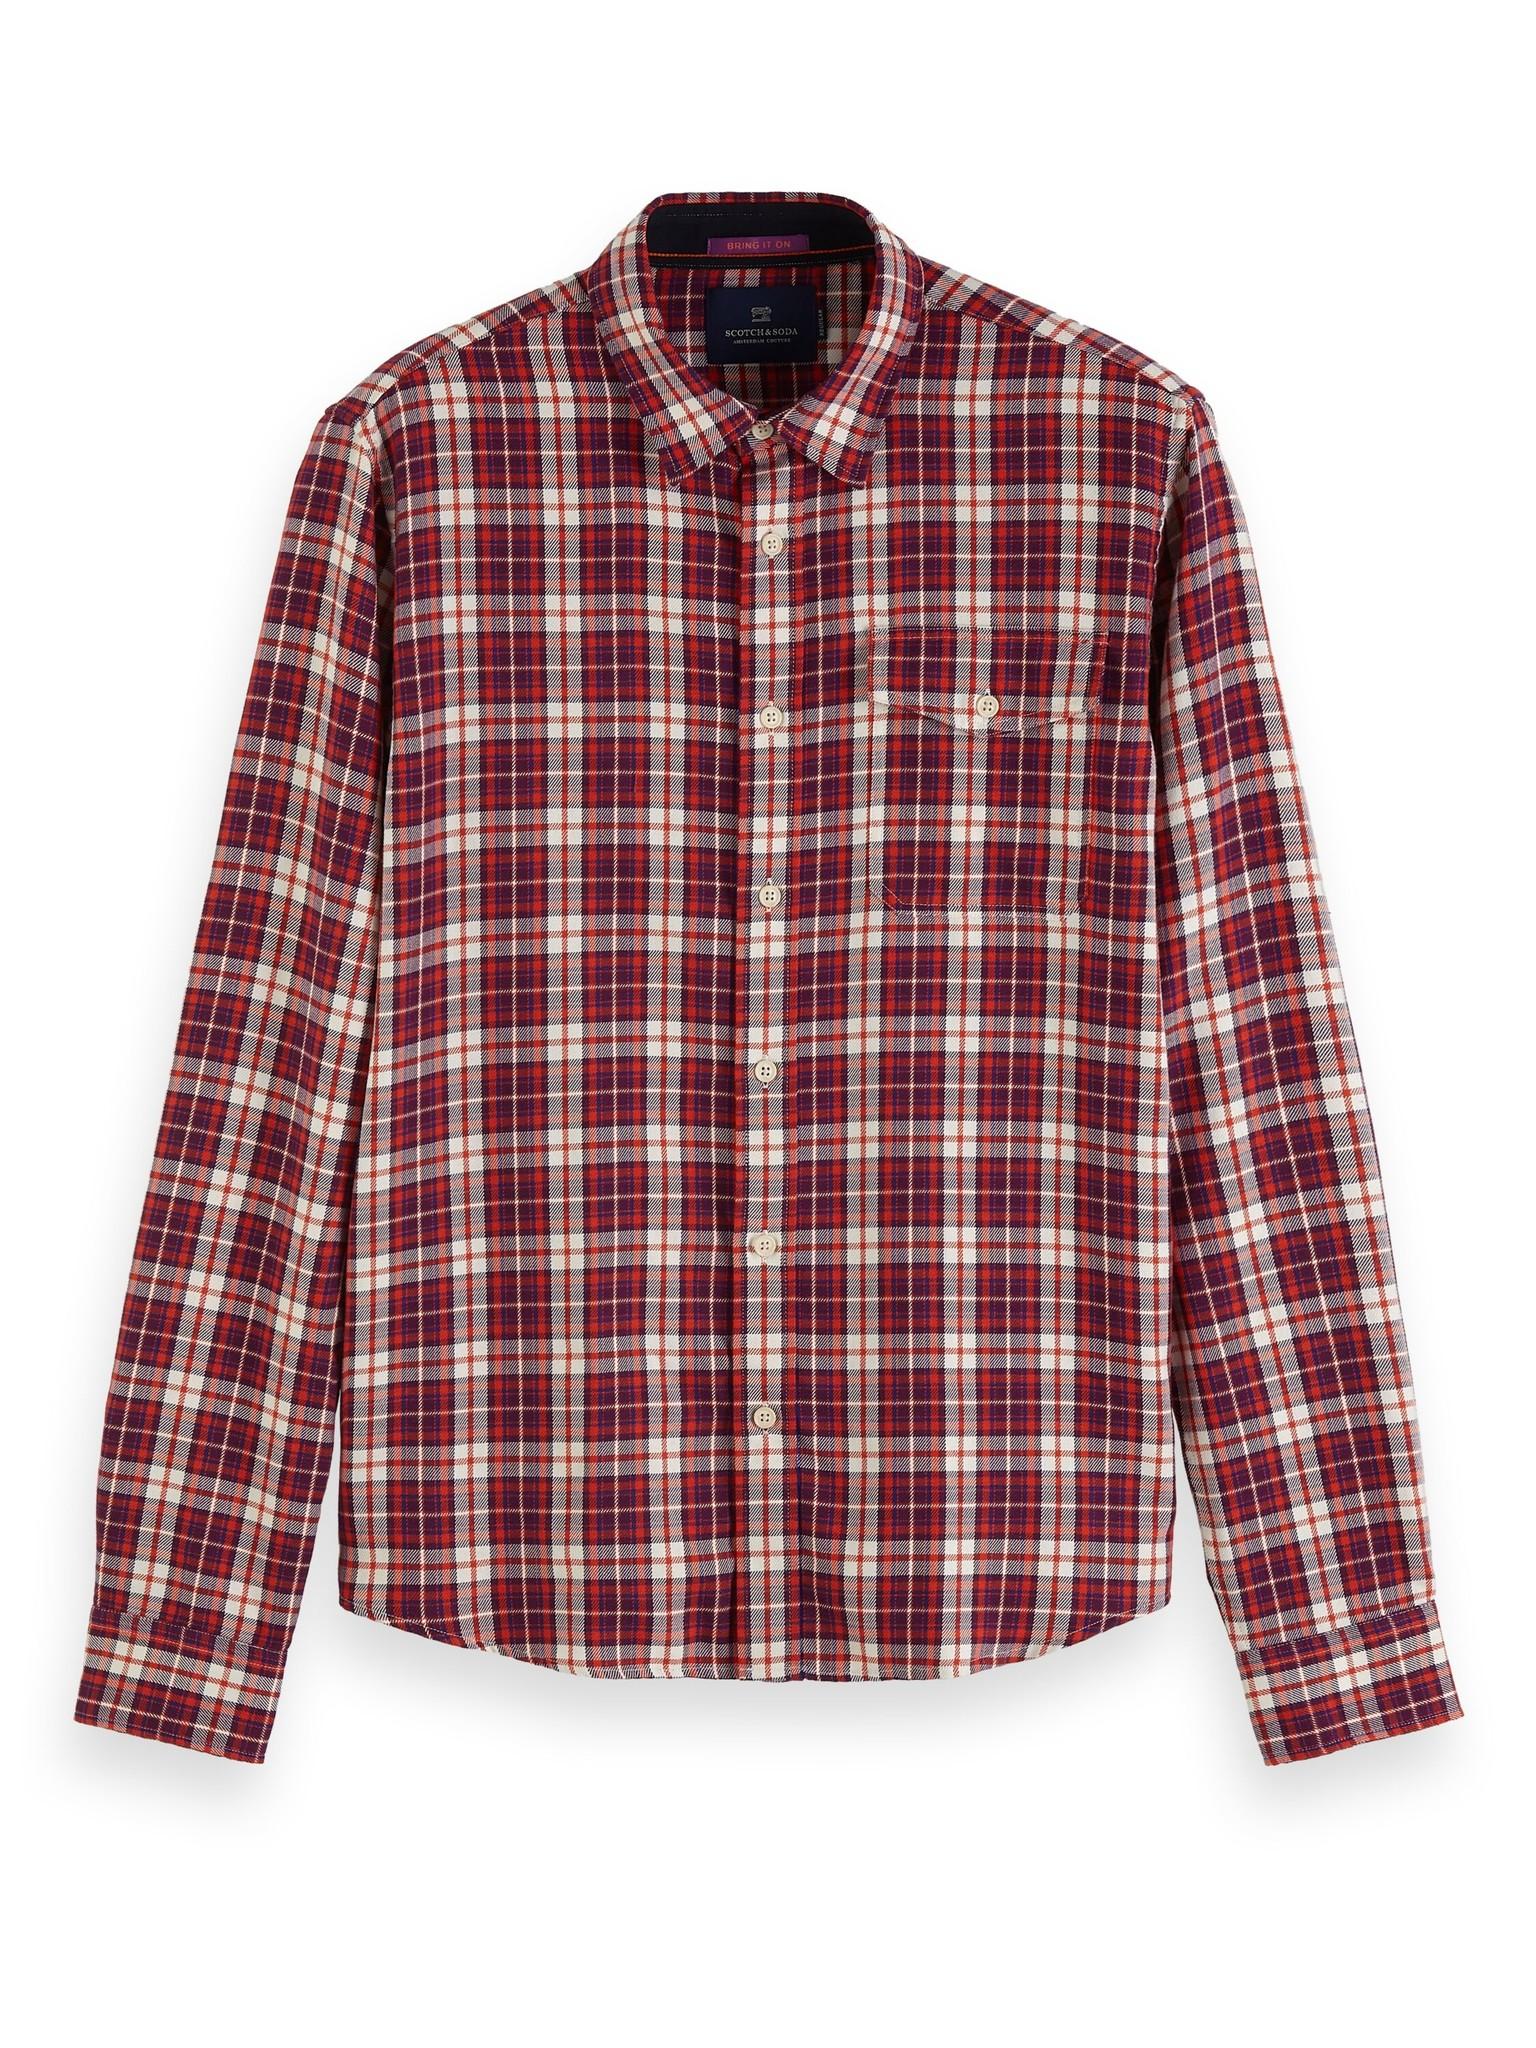 Scotch & Soda Multicolour Check Shirt | 152157